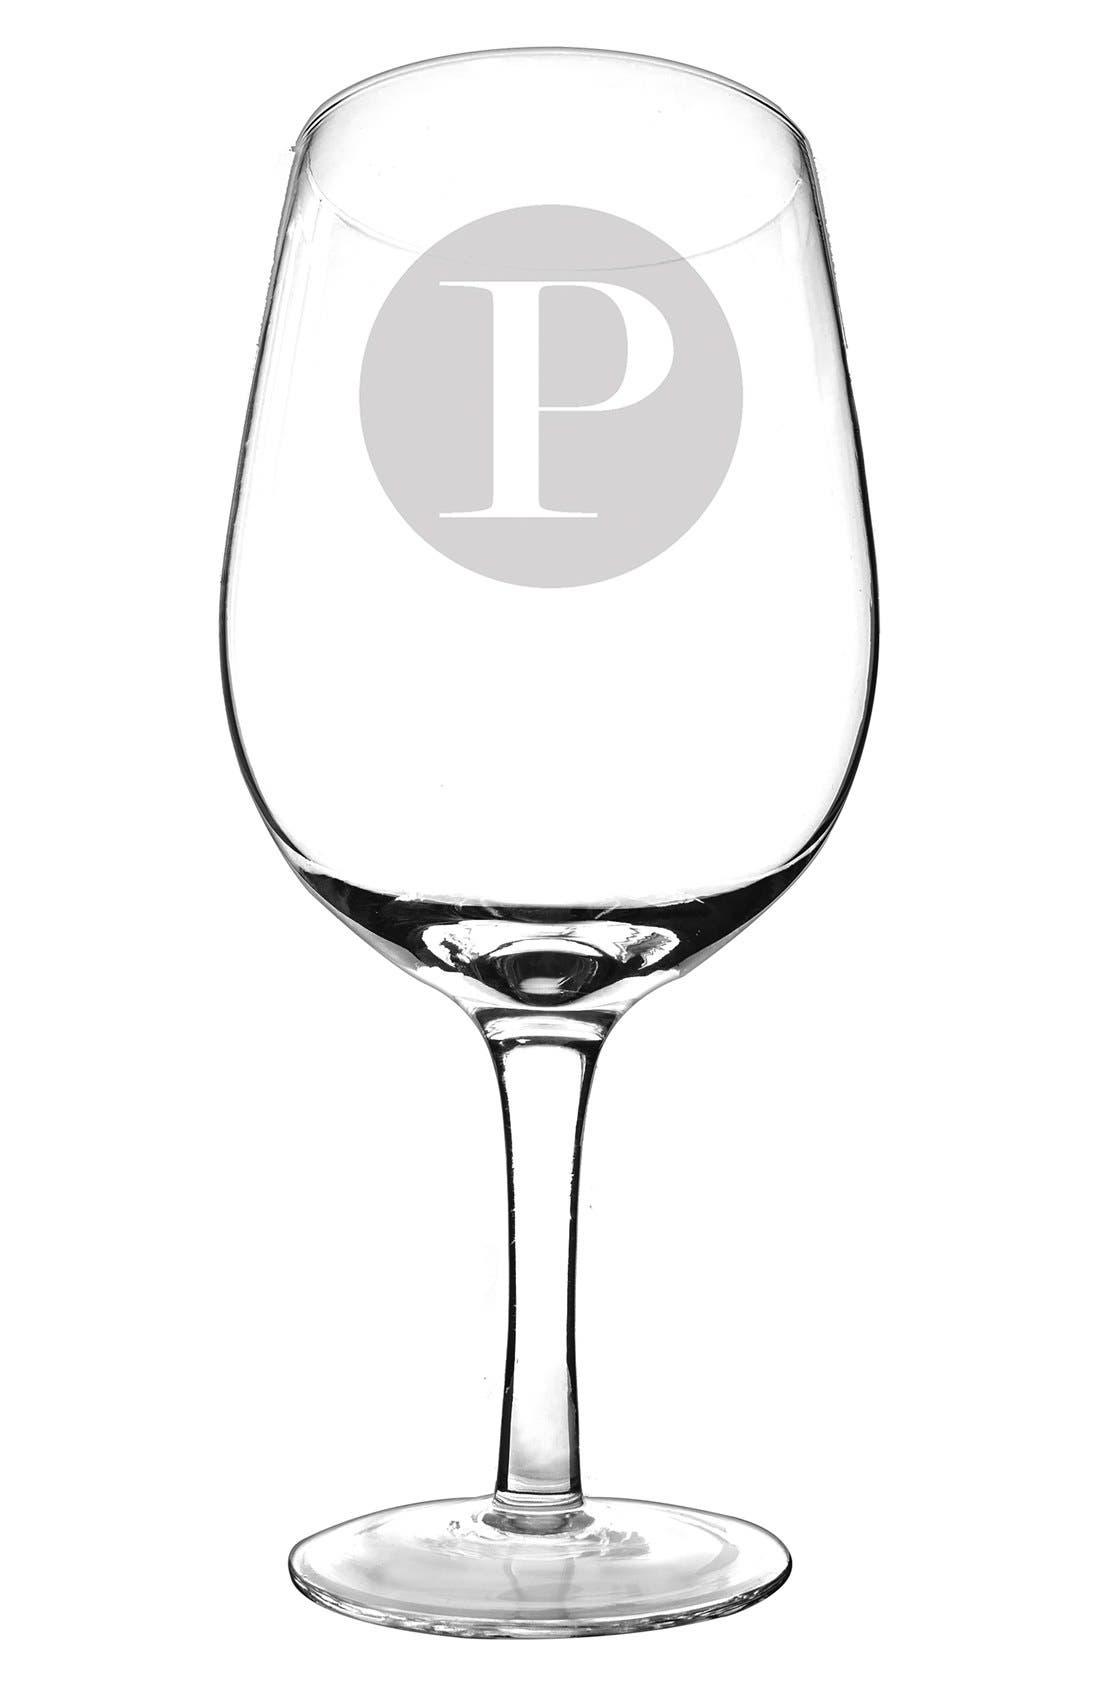 Monogram 'XL' Novelty Wine Glass,                         Main,                         color, 115